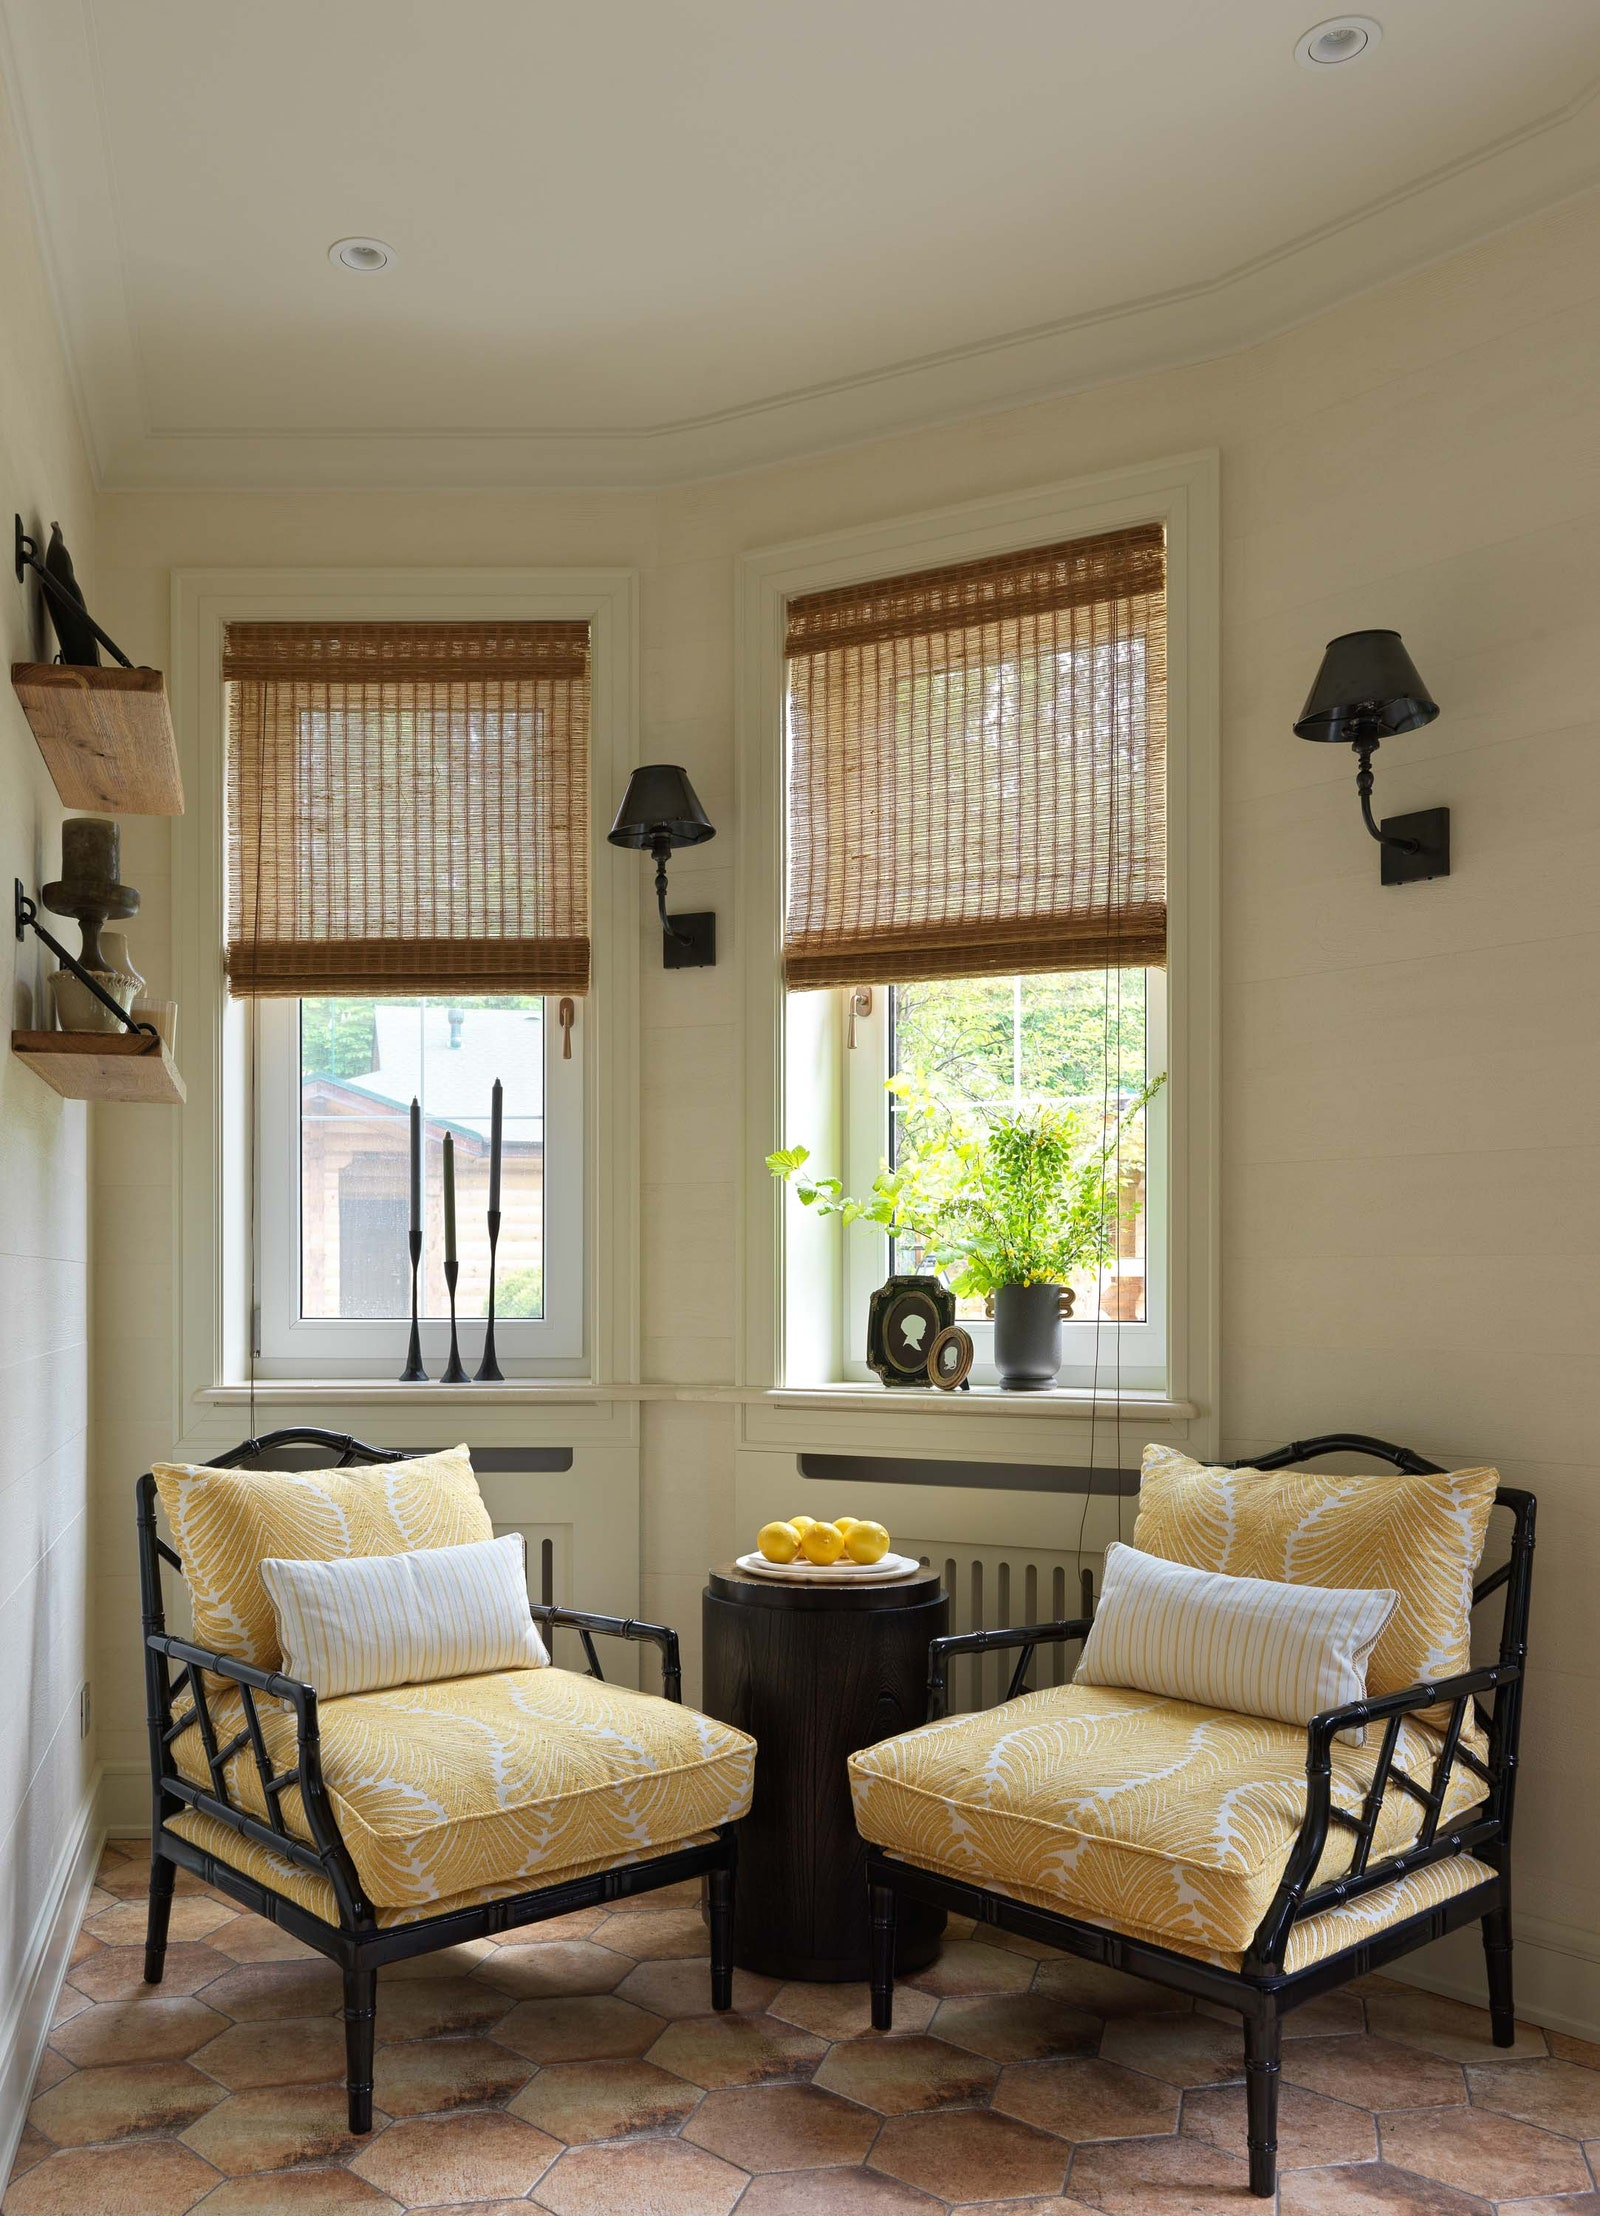 .  Guadarte   Hooker Furniture  Visual Comfort amp Co.    Don Maison.      Moonstores.    .